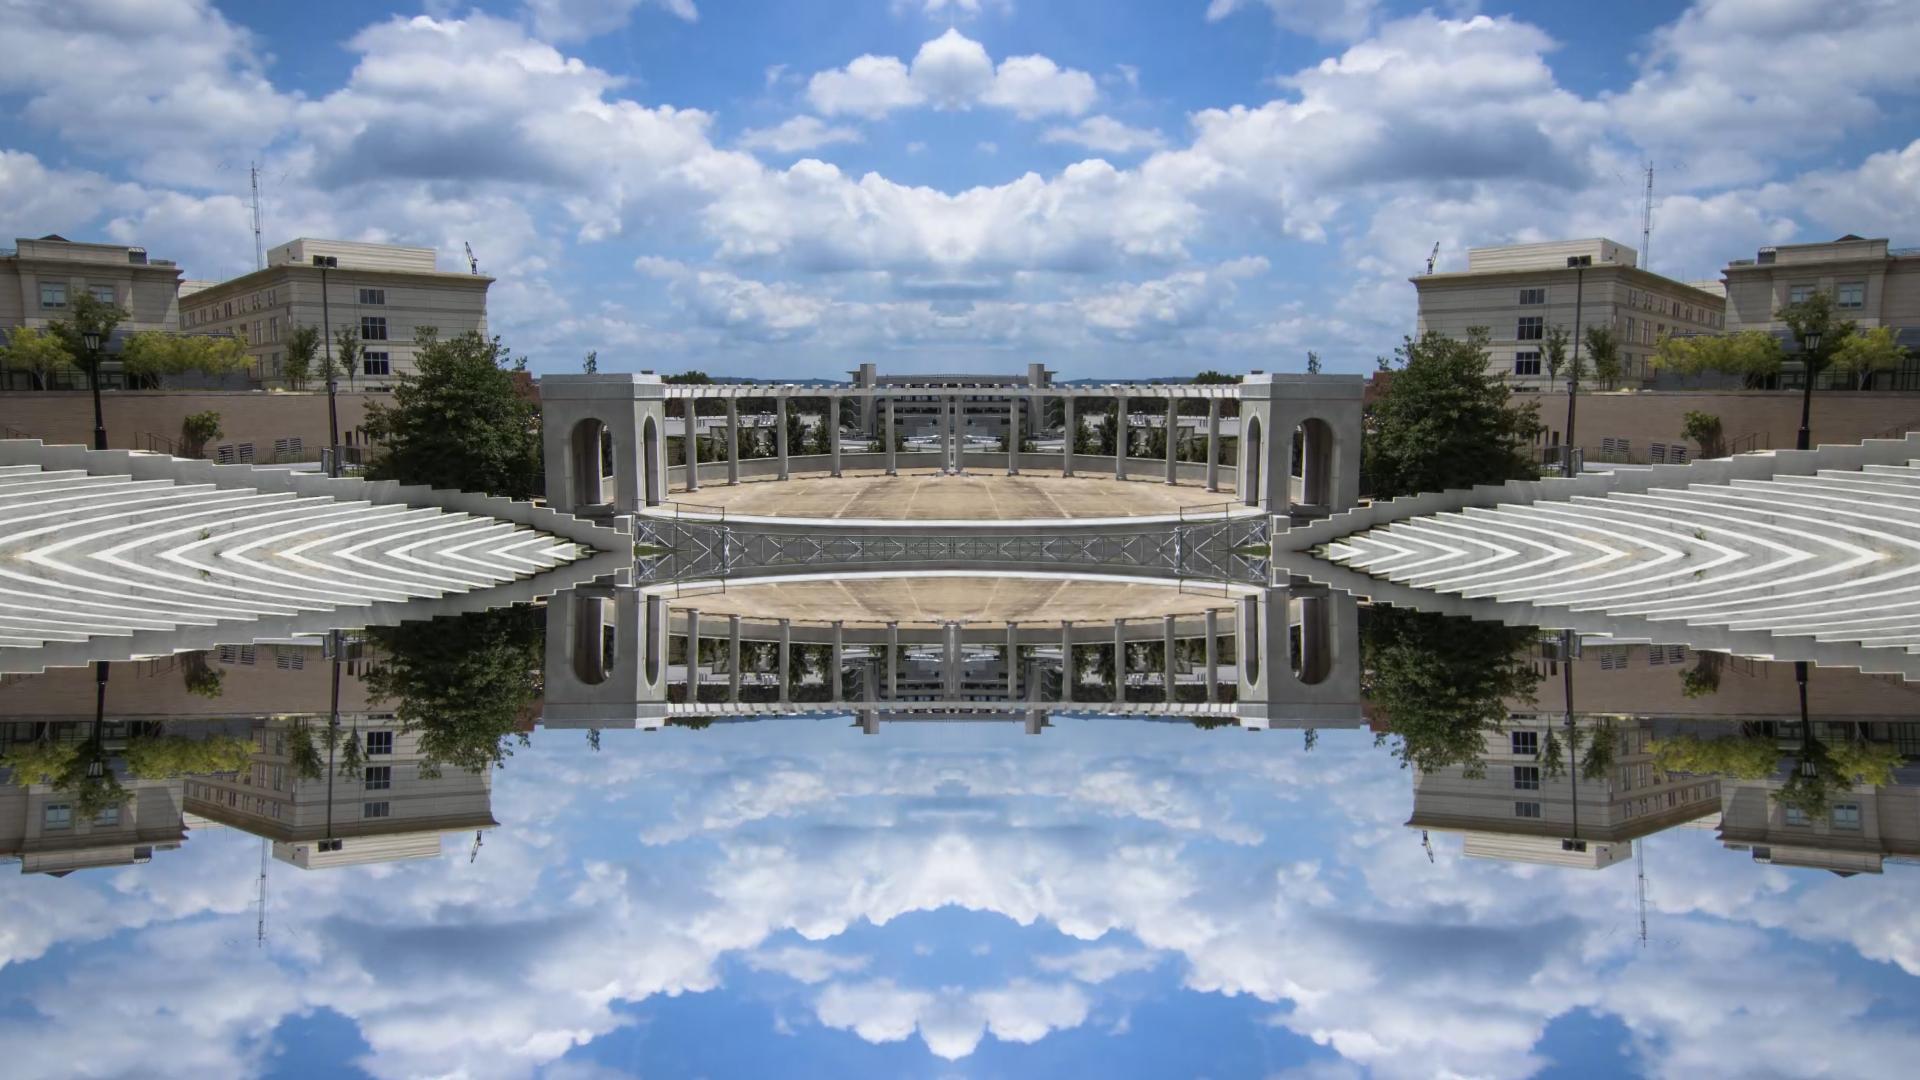 U of A Mirrored